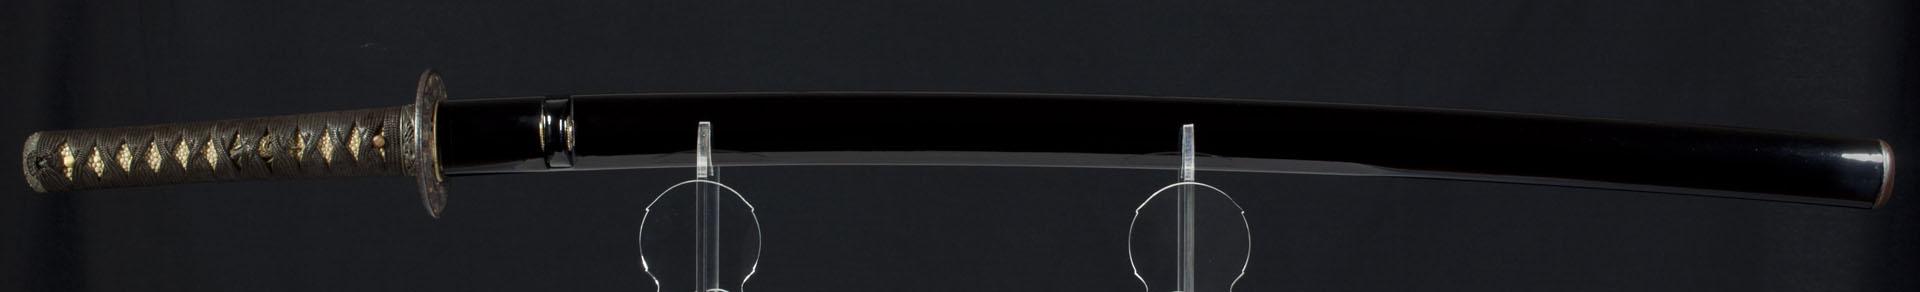 Katana Tadatsuna nidai japanese sword (10)